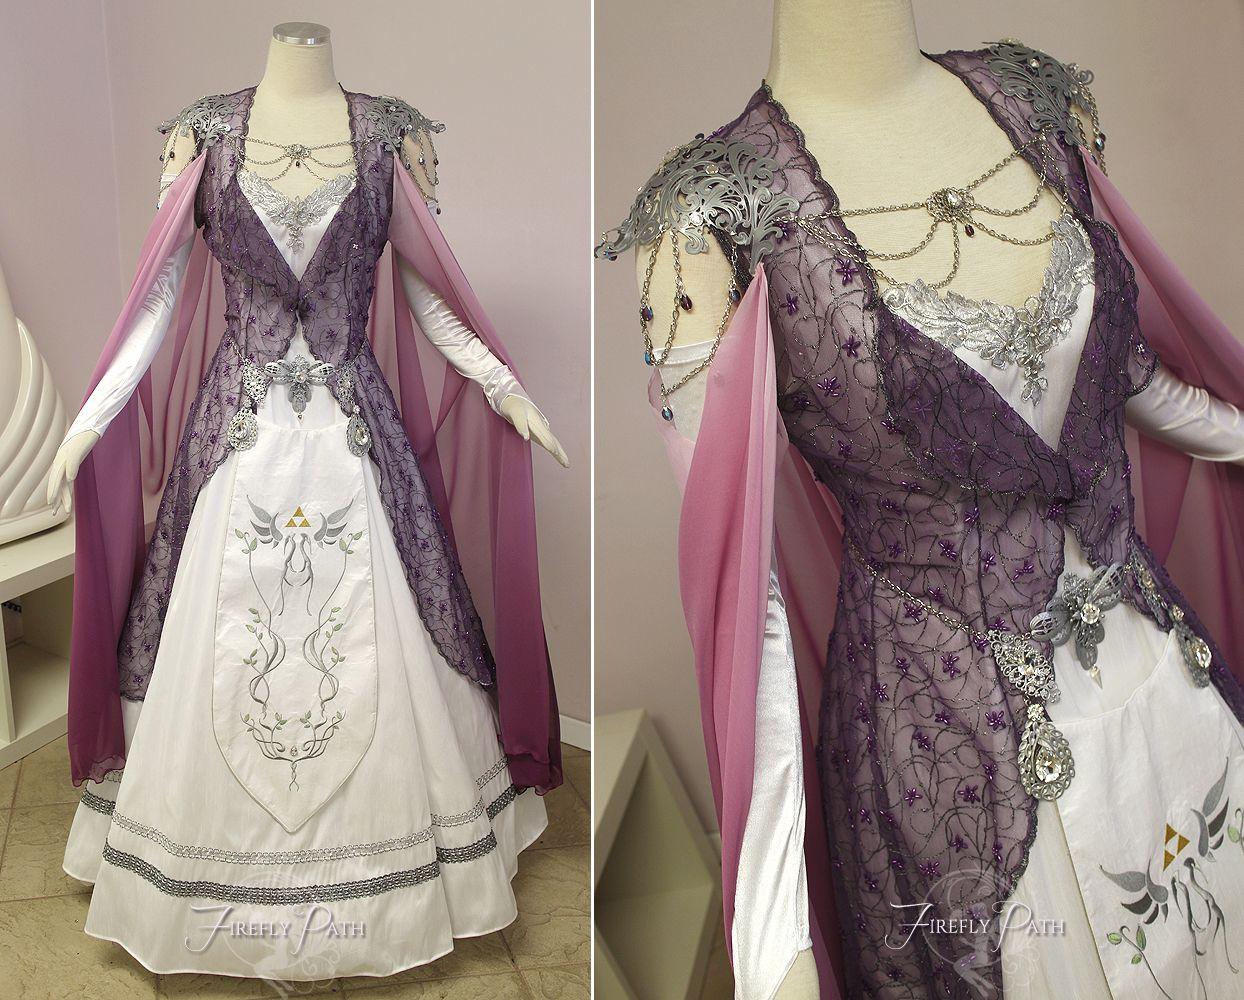 Princess Zelda Bridal Gown Fantasy Gowns Fantasy Dress Pretty Dresses